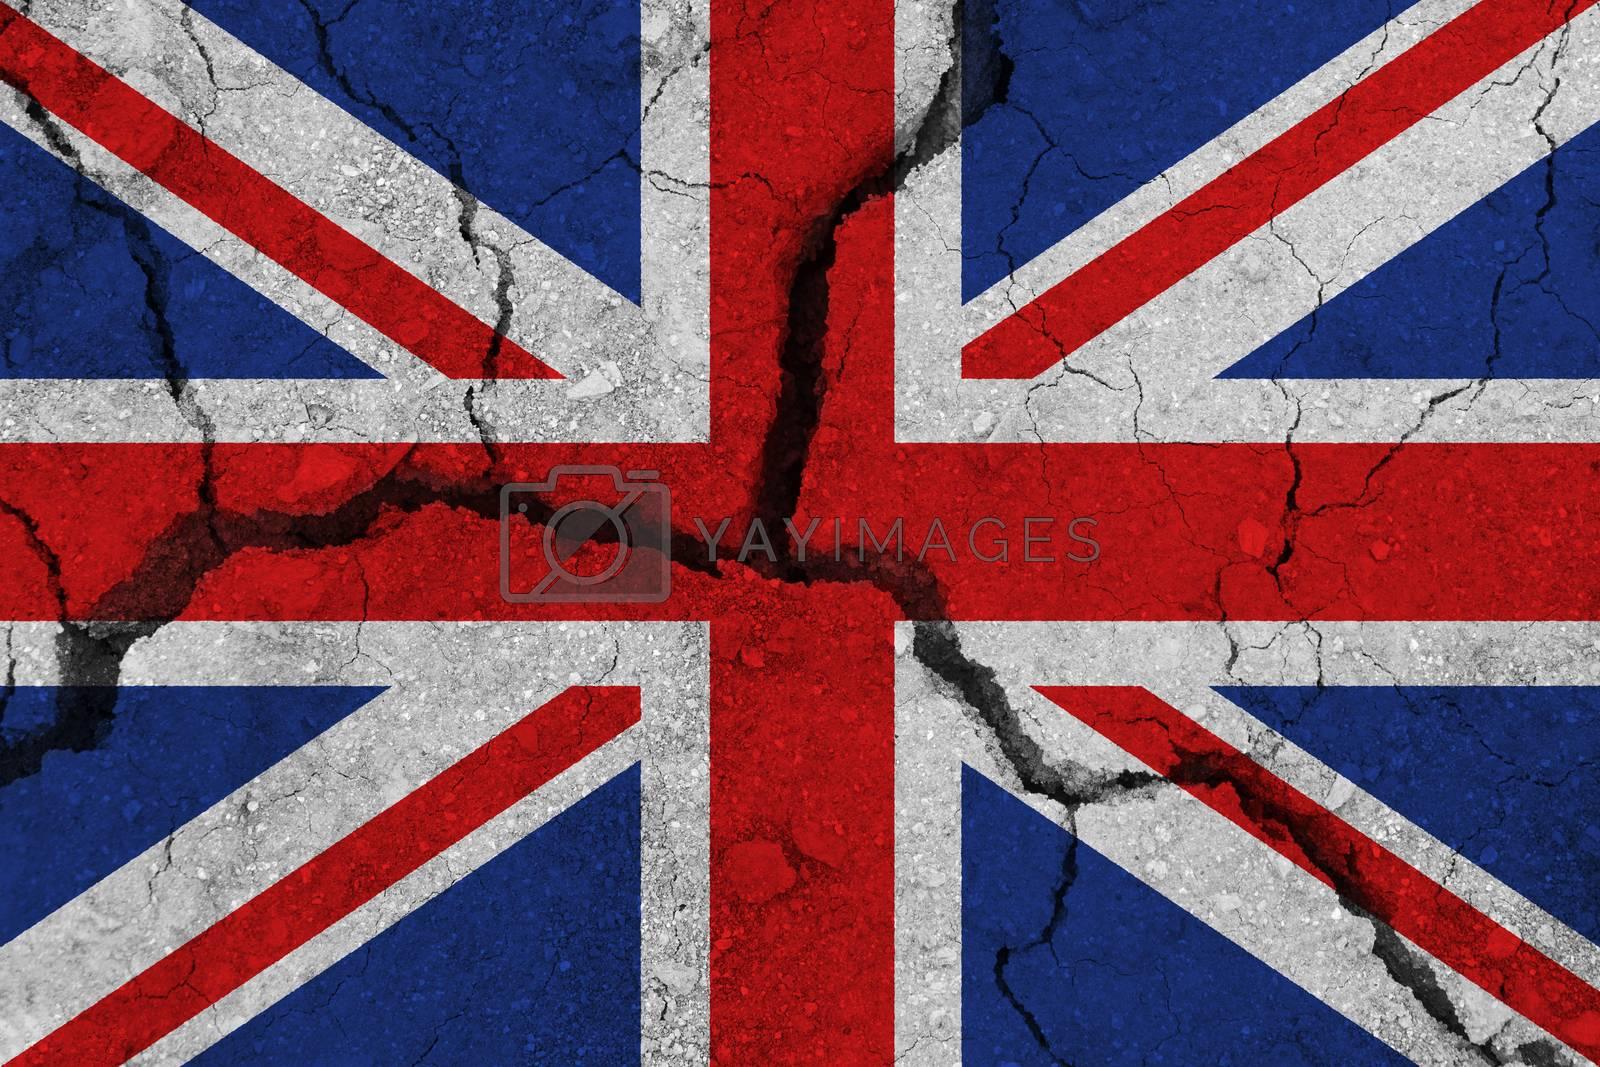 United Kingdom flag on the cracked earth. National flag of United Kingdom. Earthquake or drought concept